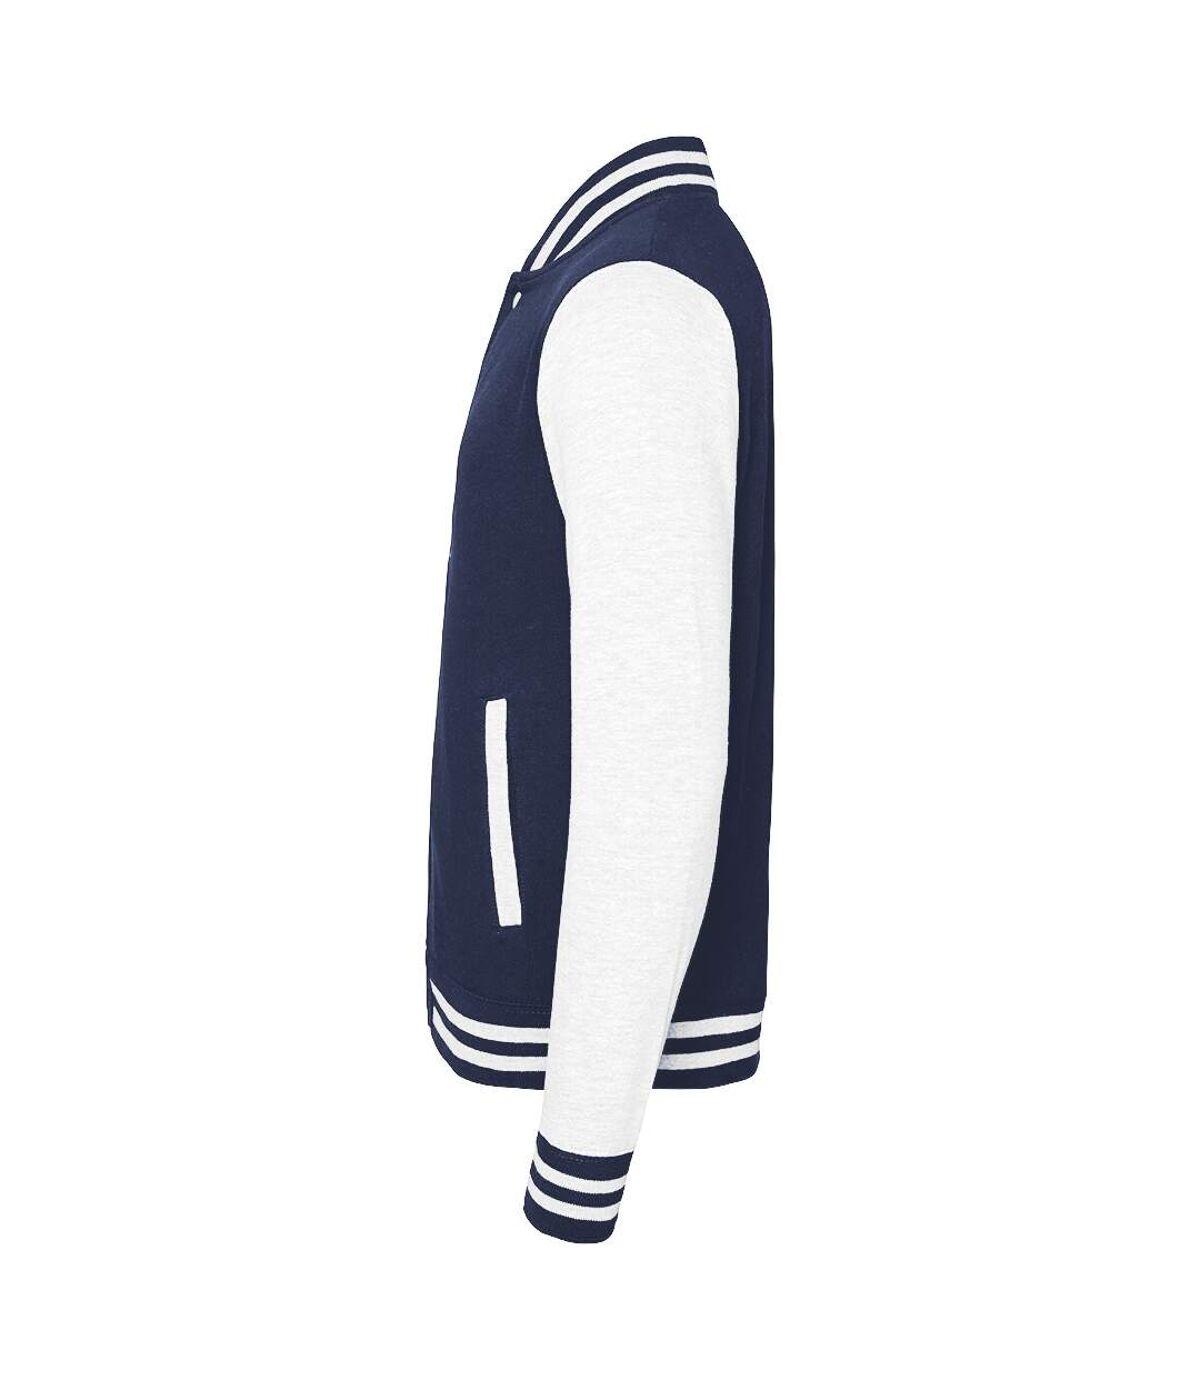 Awdis Unisex Varsity Jacket (Oxford Navy / White) - UTRW175